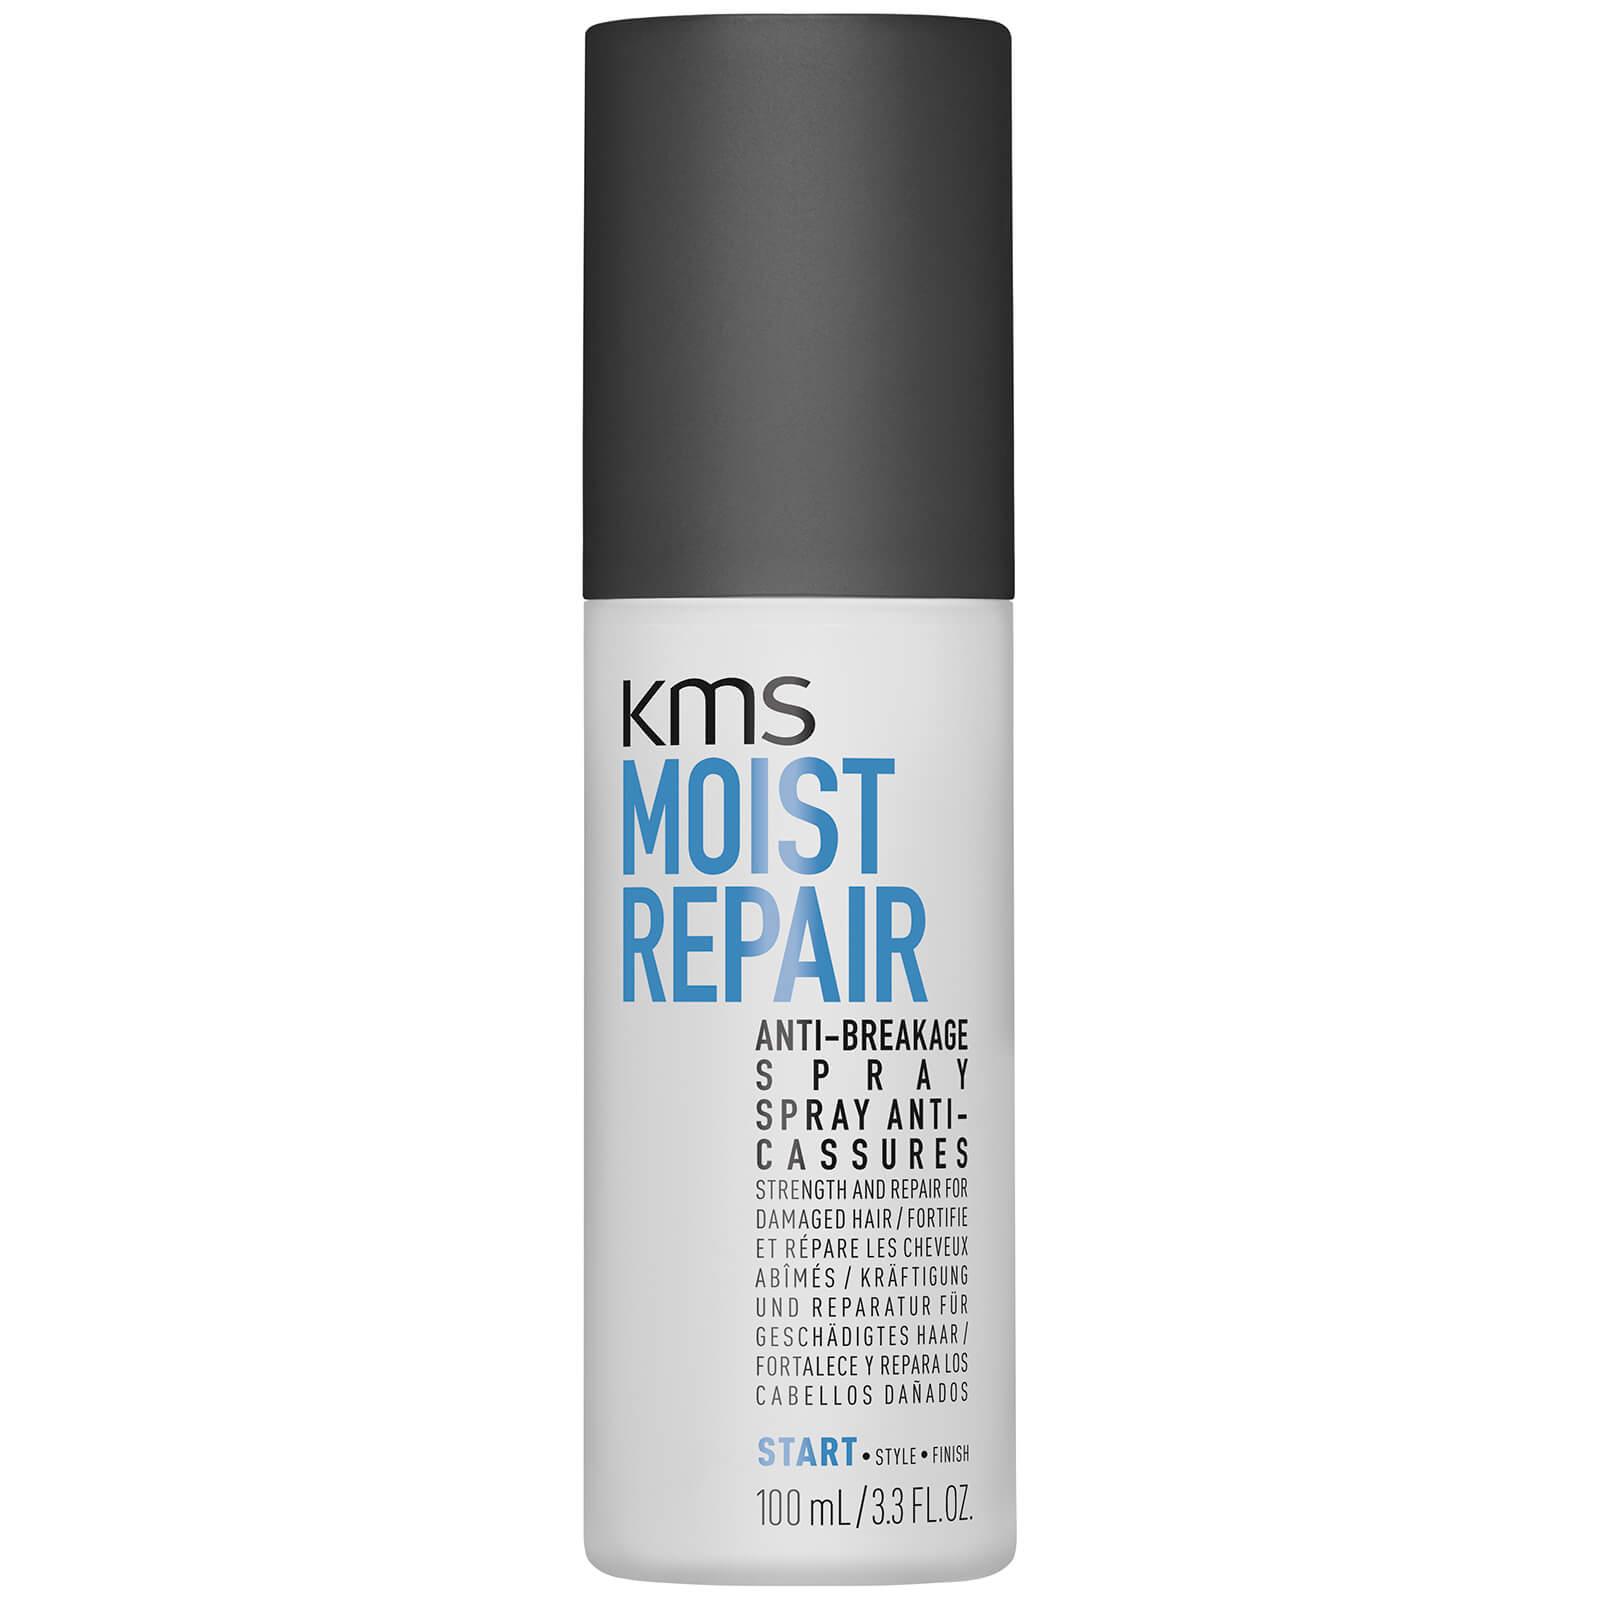 KMS Spray Anti-Cassures Moist RepairKMS 100ml